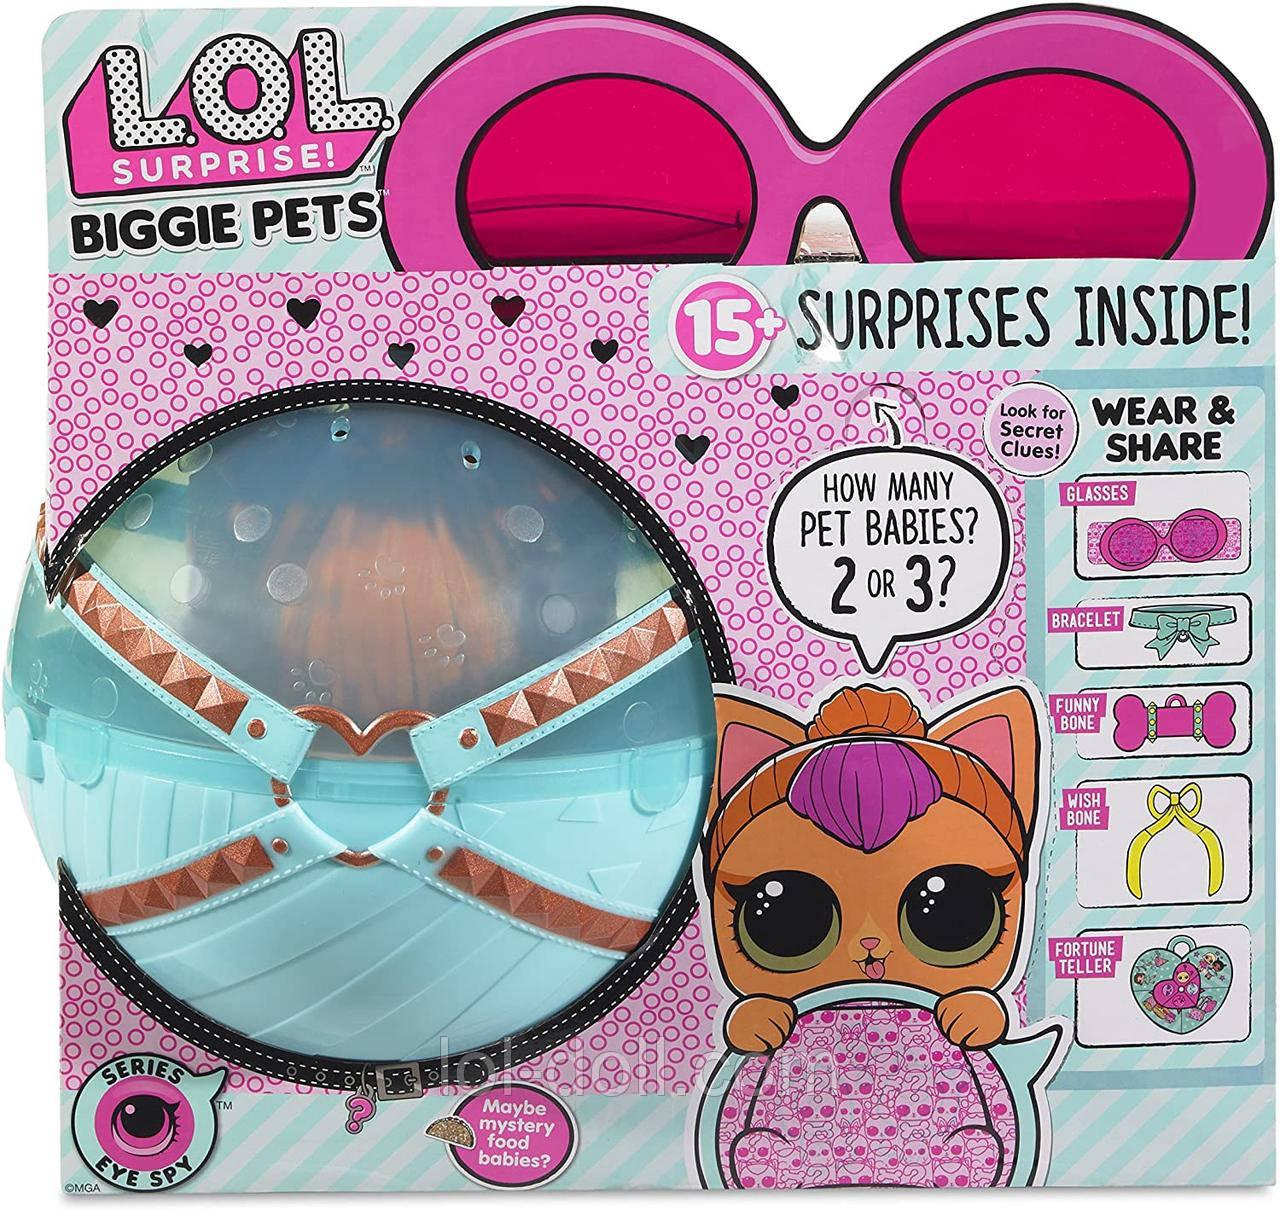 Кукла ЛОЛ Большой Питомец Неон Китти Оригинал L.O.L. Surprise!  - Biggie Pets Neon Kitty